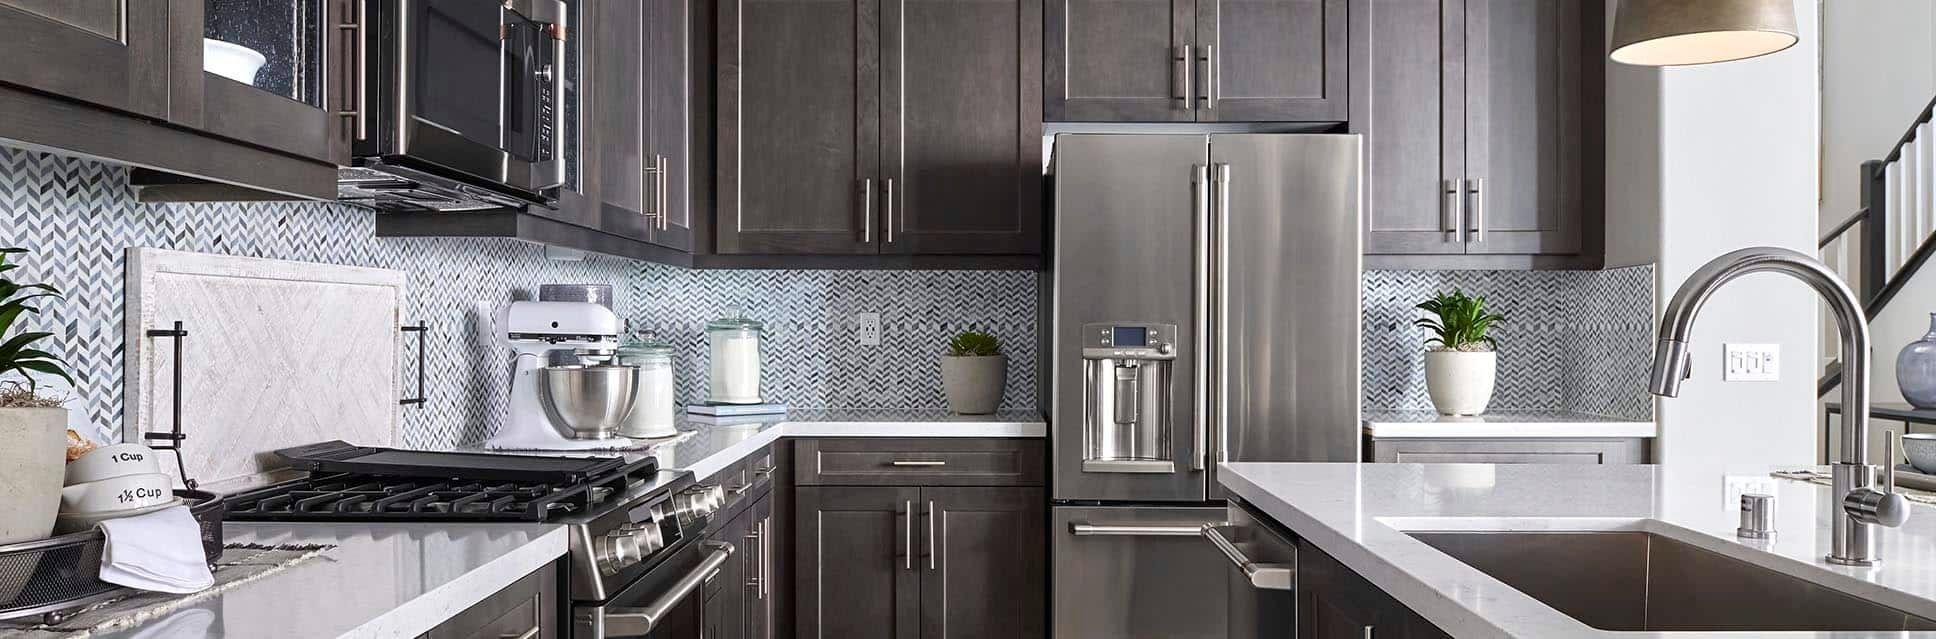 Kitchen featured in the Plan 3 By Tri Pointe Homes in Riverside-San Bernardino, CA